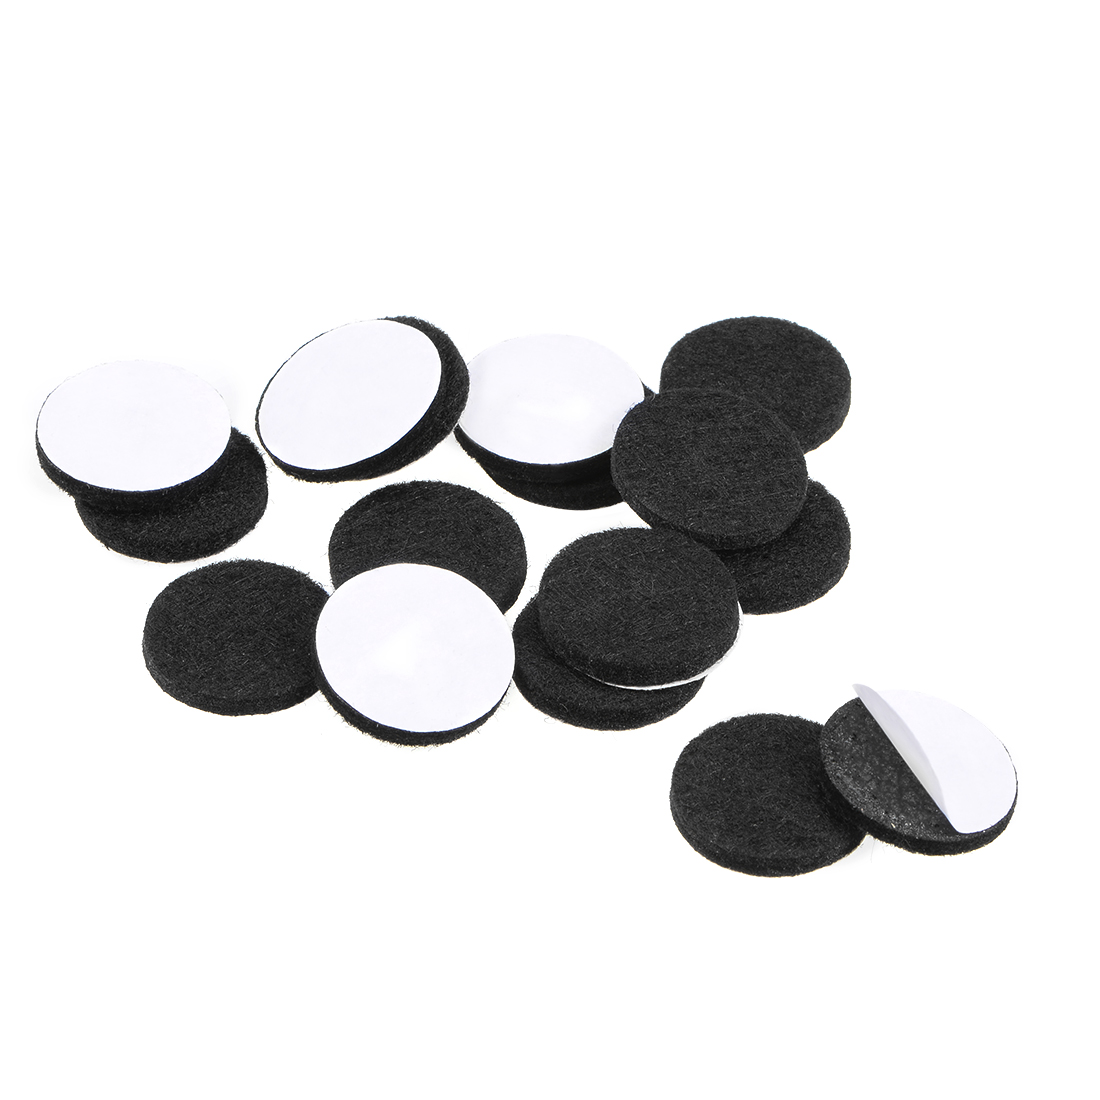 Furniture Pads Adhesive Felt Pads 20mm Diameter 3mm Thick Round Black 16Pcs